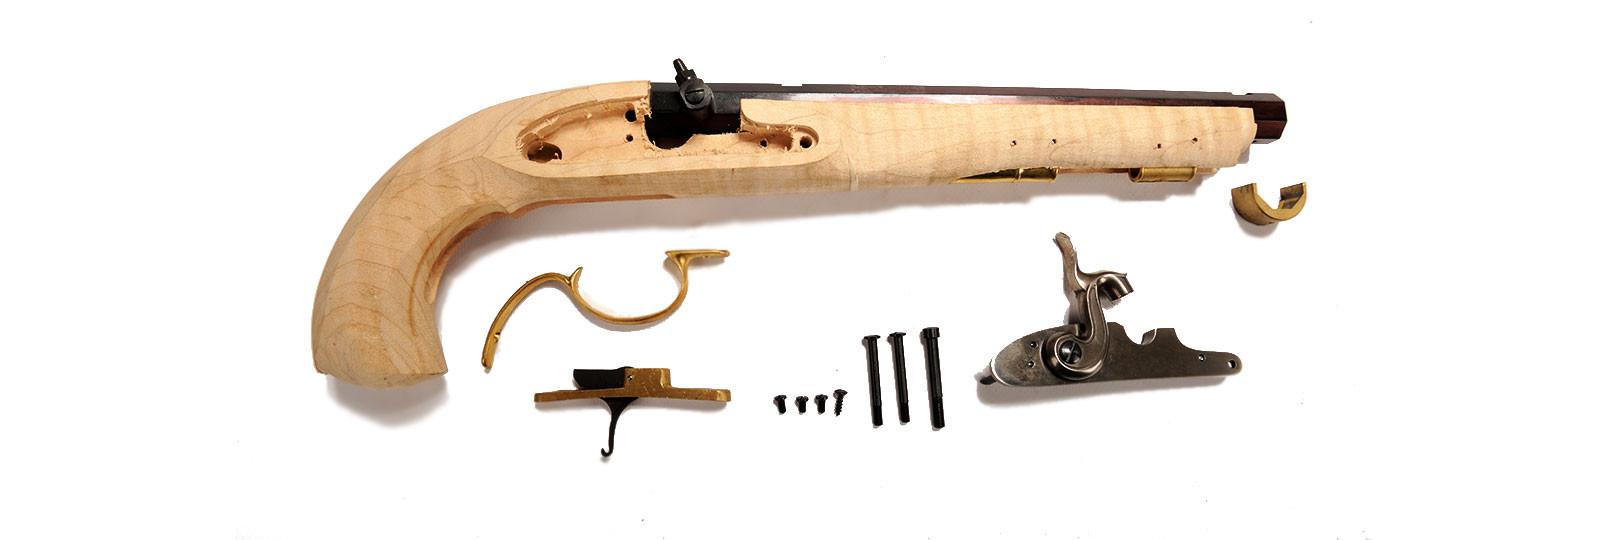 "Kit pistola Kentucky ""maple"" a percussione"